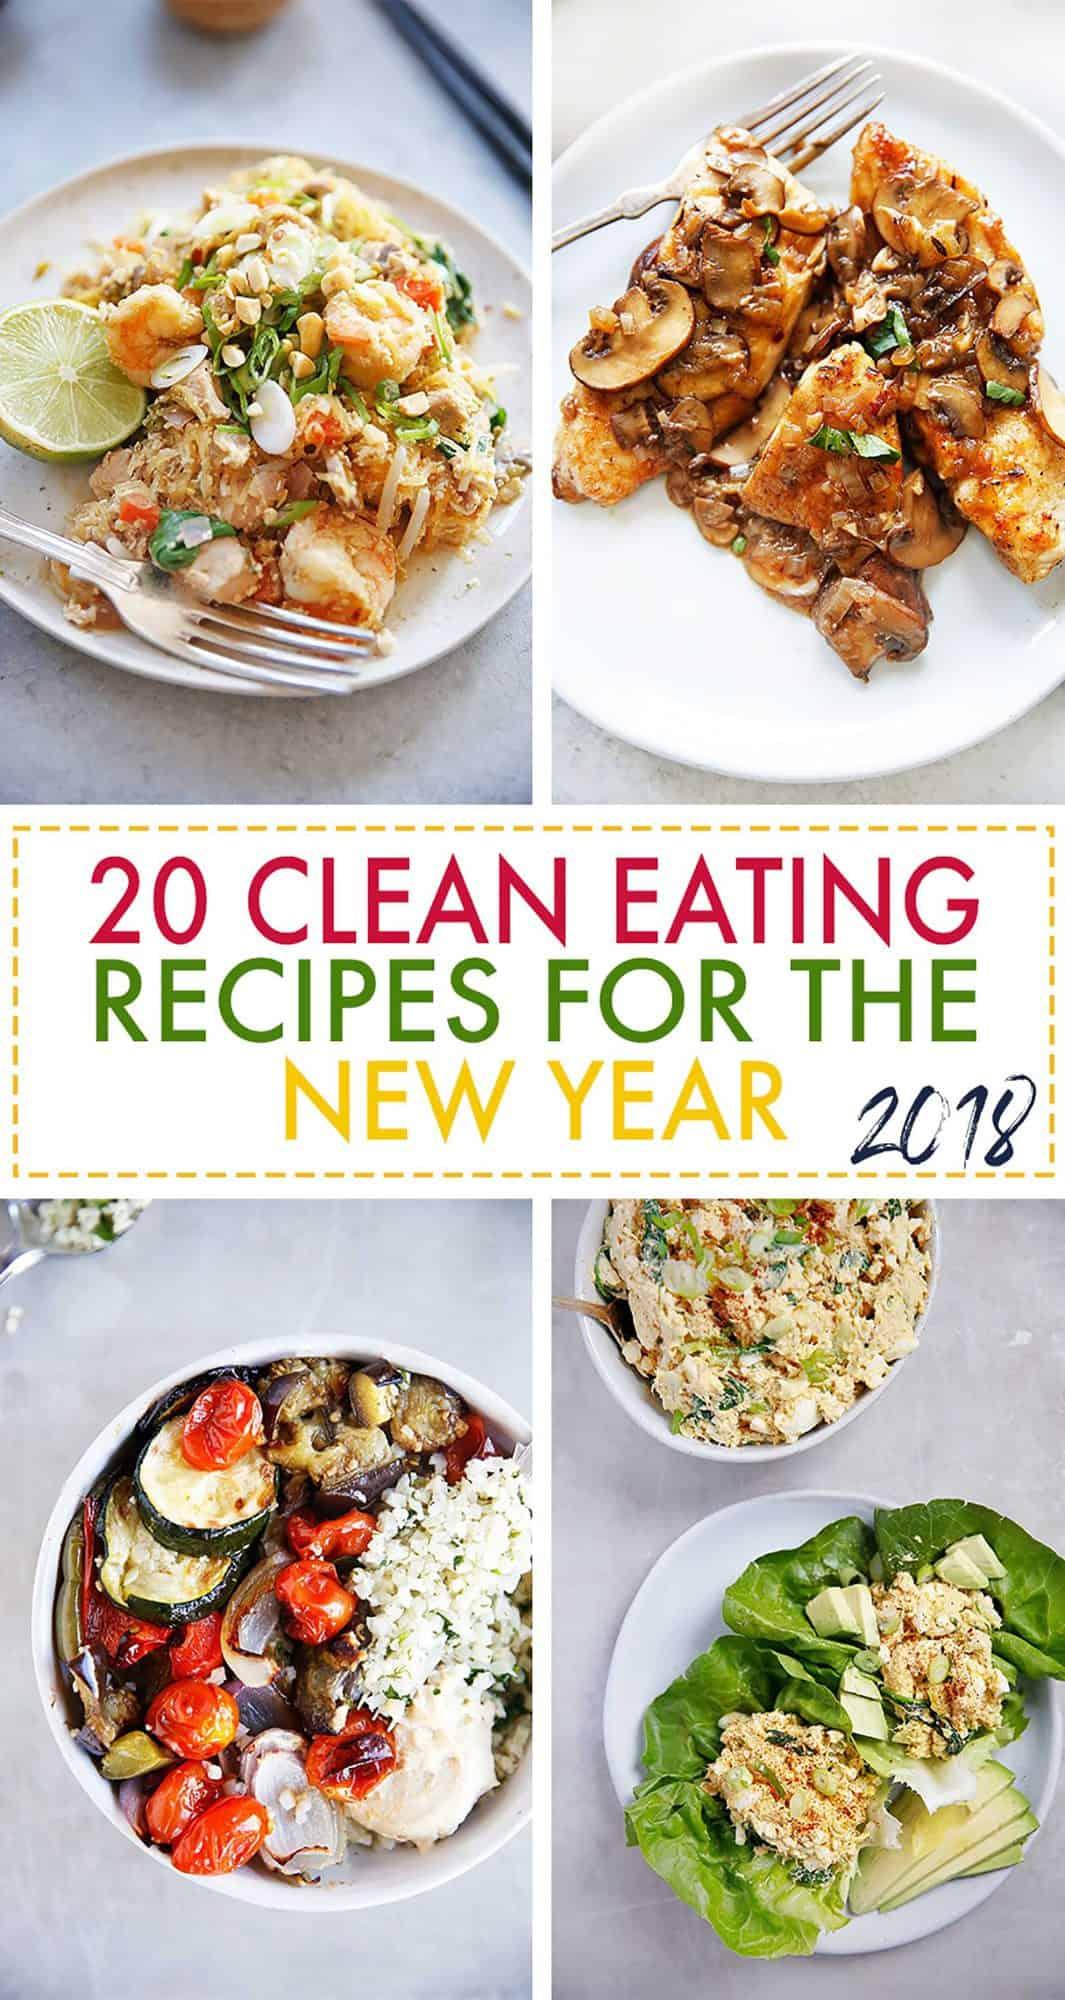 Lexi S Clean Kitchen Recipes